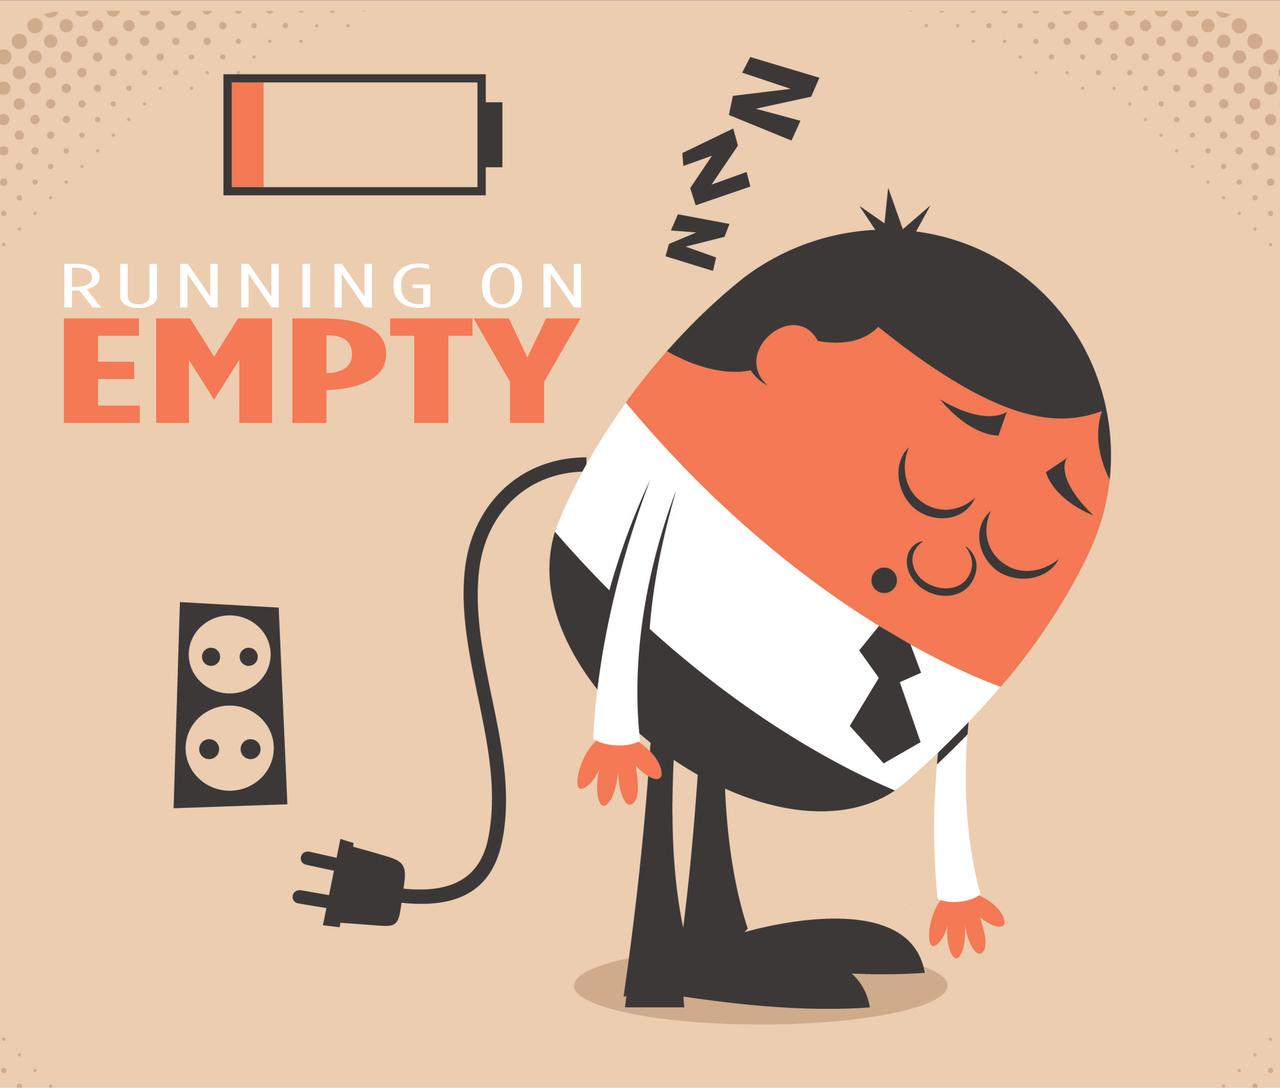 Man Running on Empty